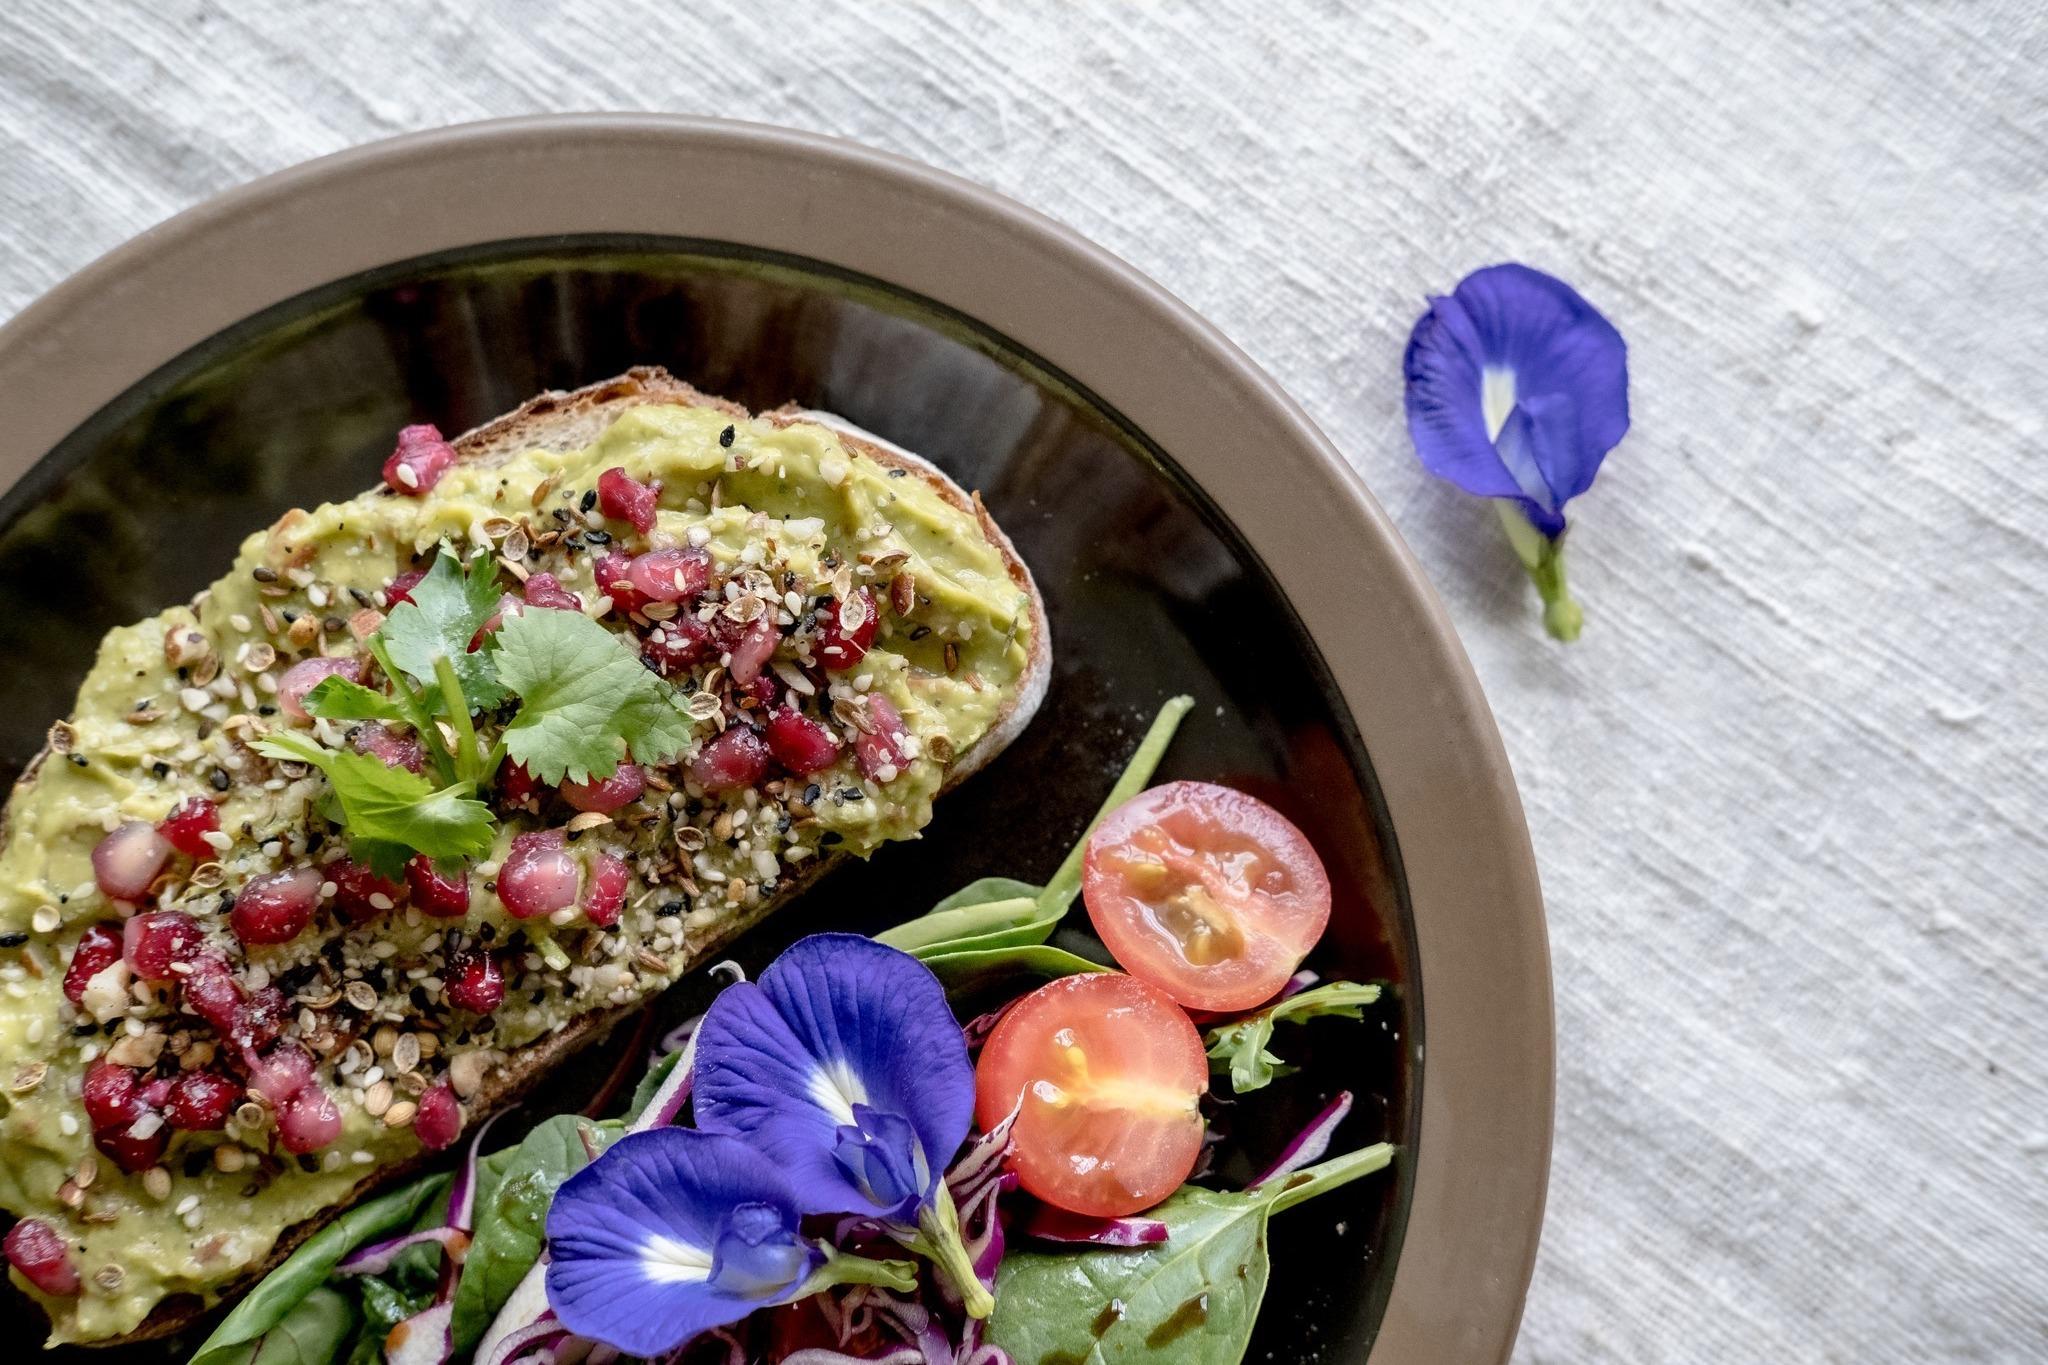 The best vegetarian and vegan restaurants in Singapore